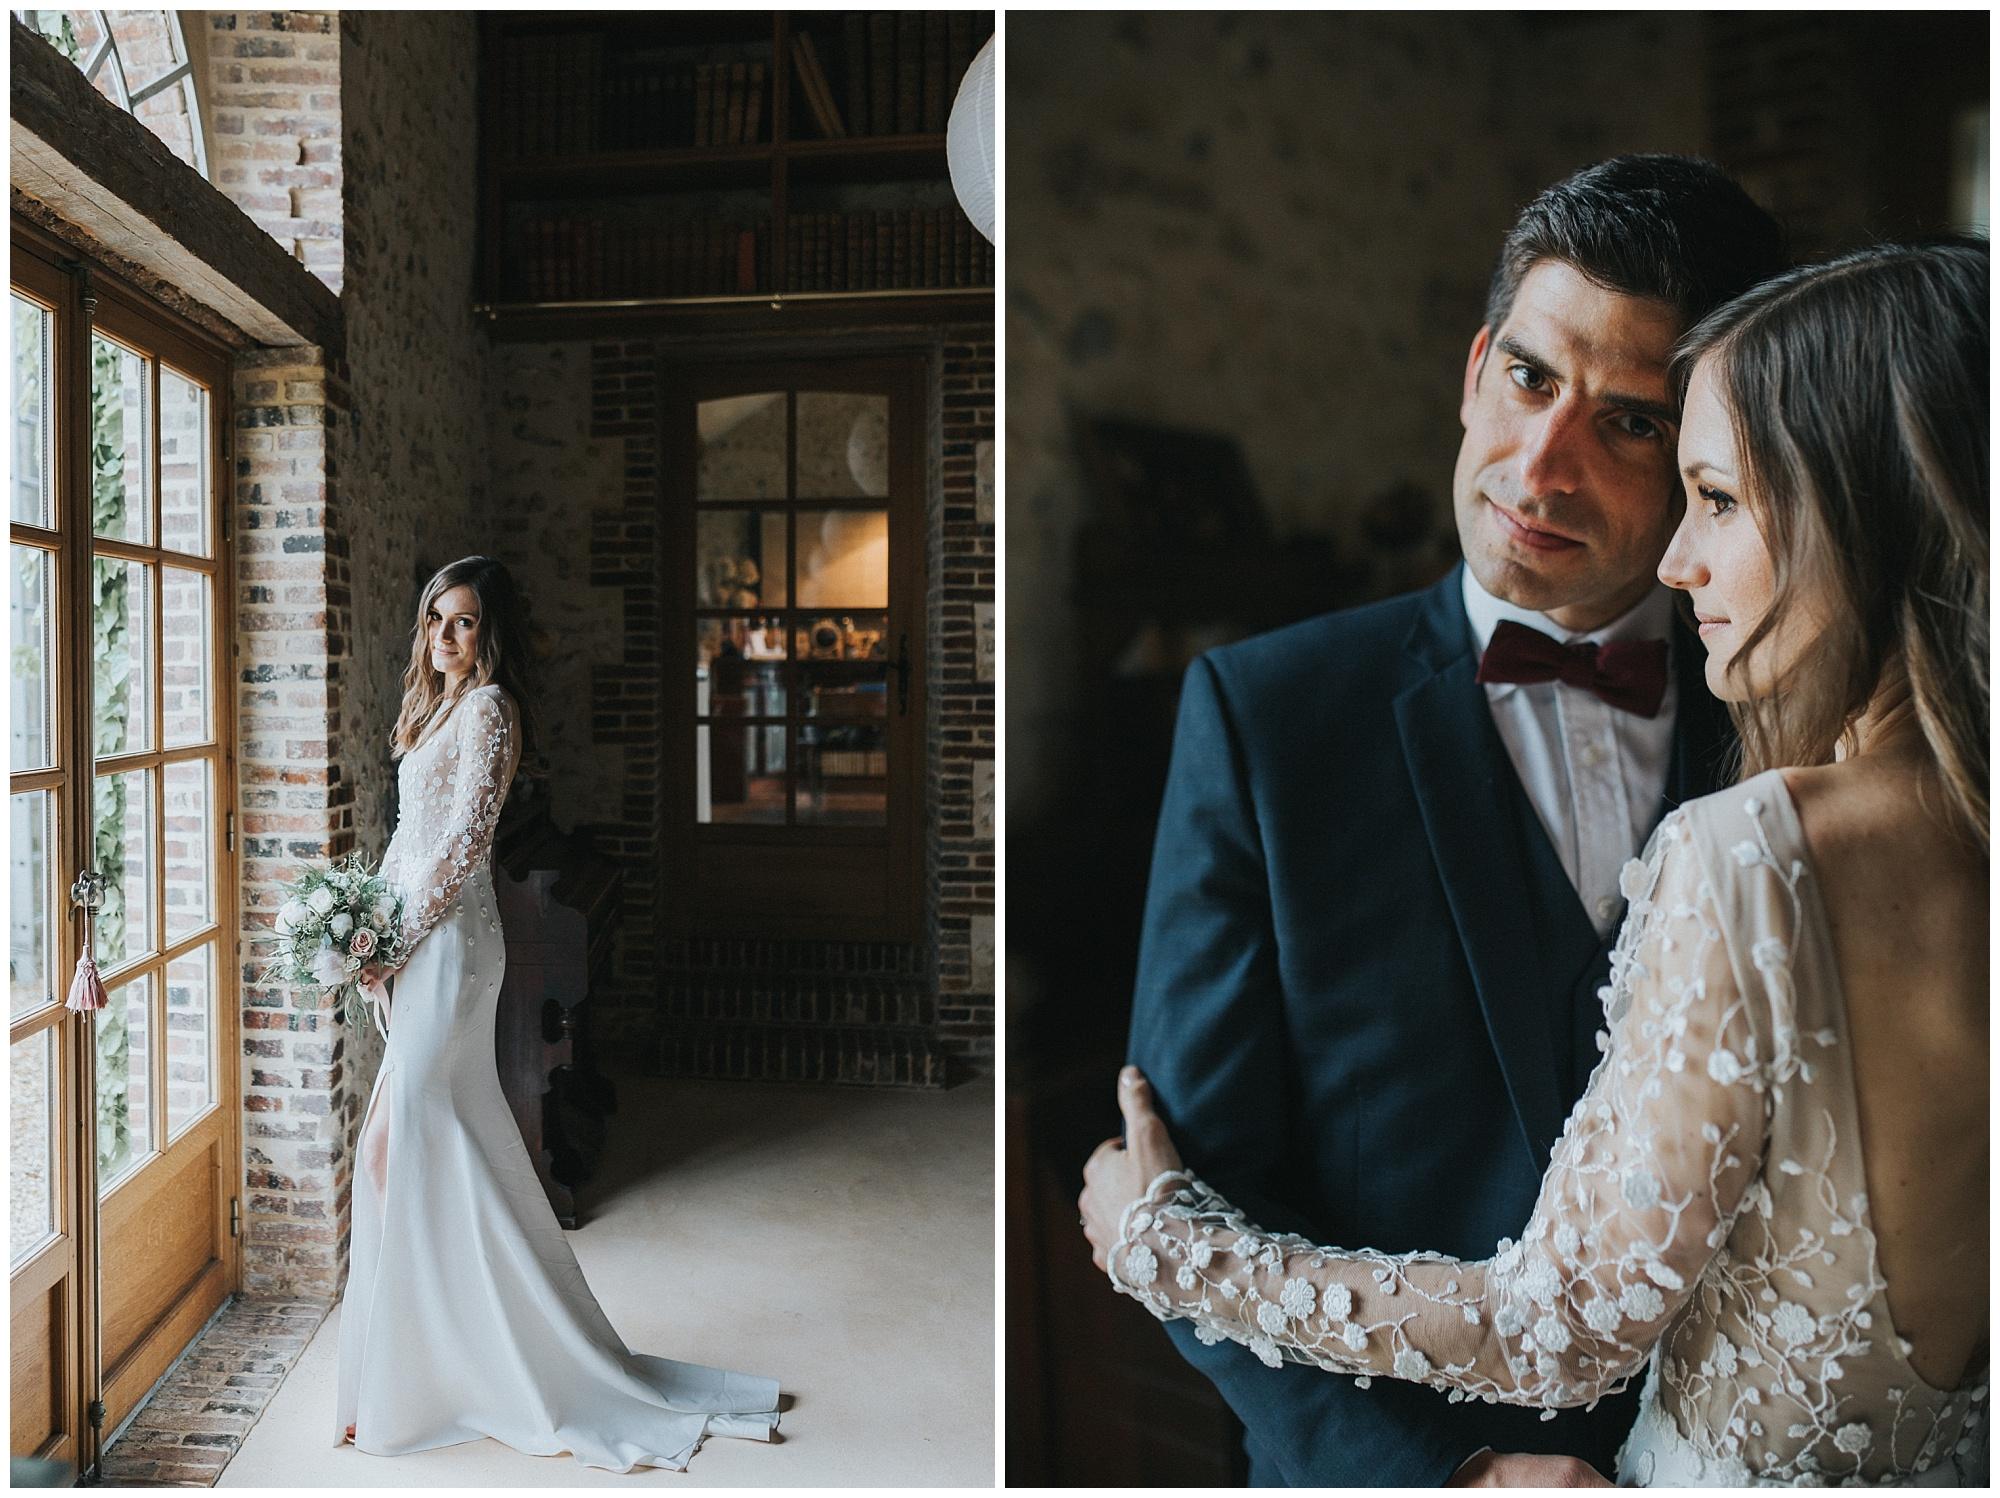 Kateryna-photos-photographer-rouen-domaine-des-evis-photos-de-couple-romantique